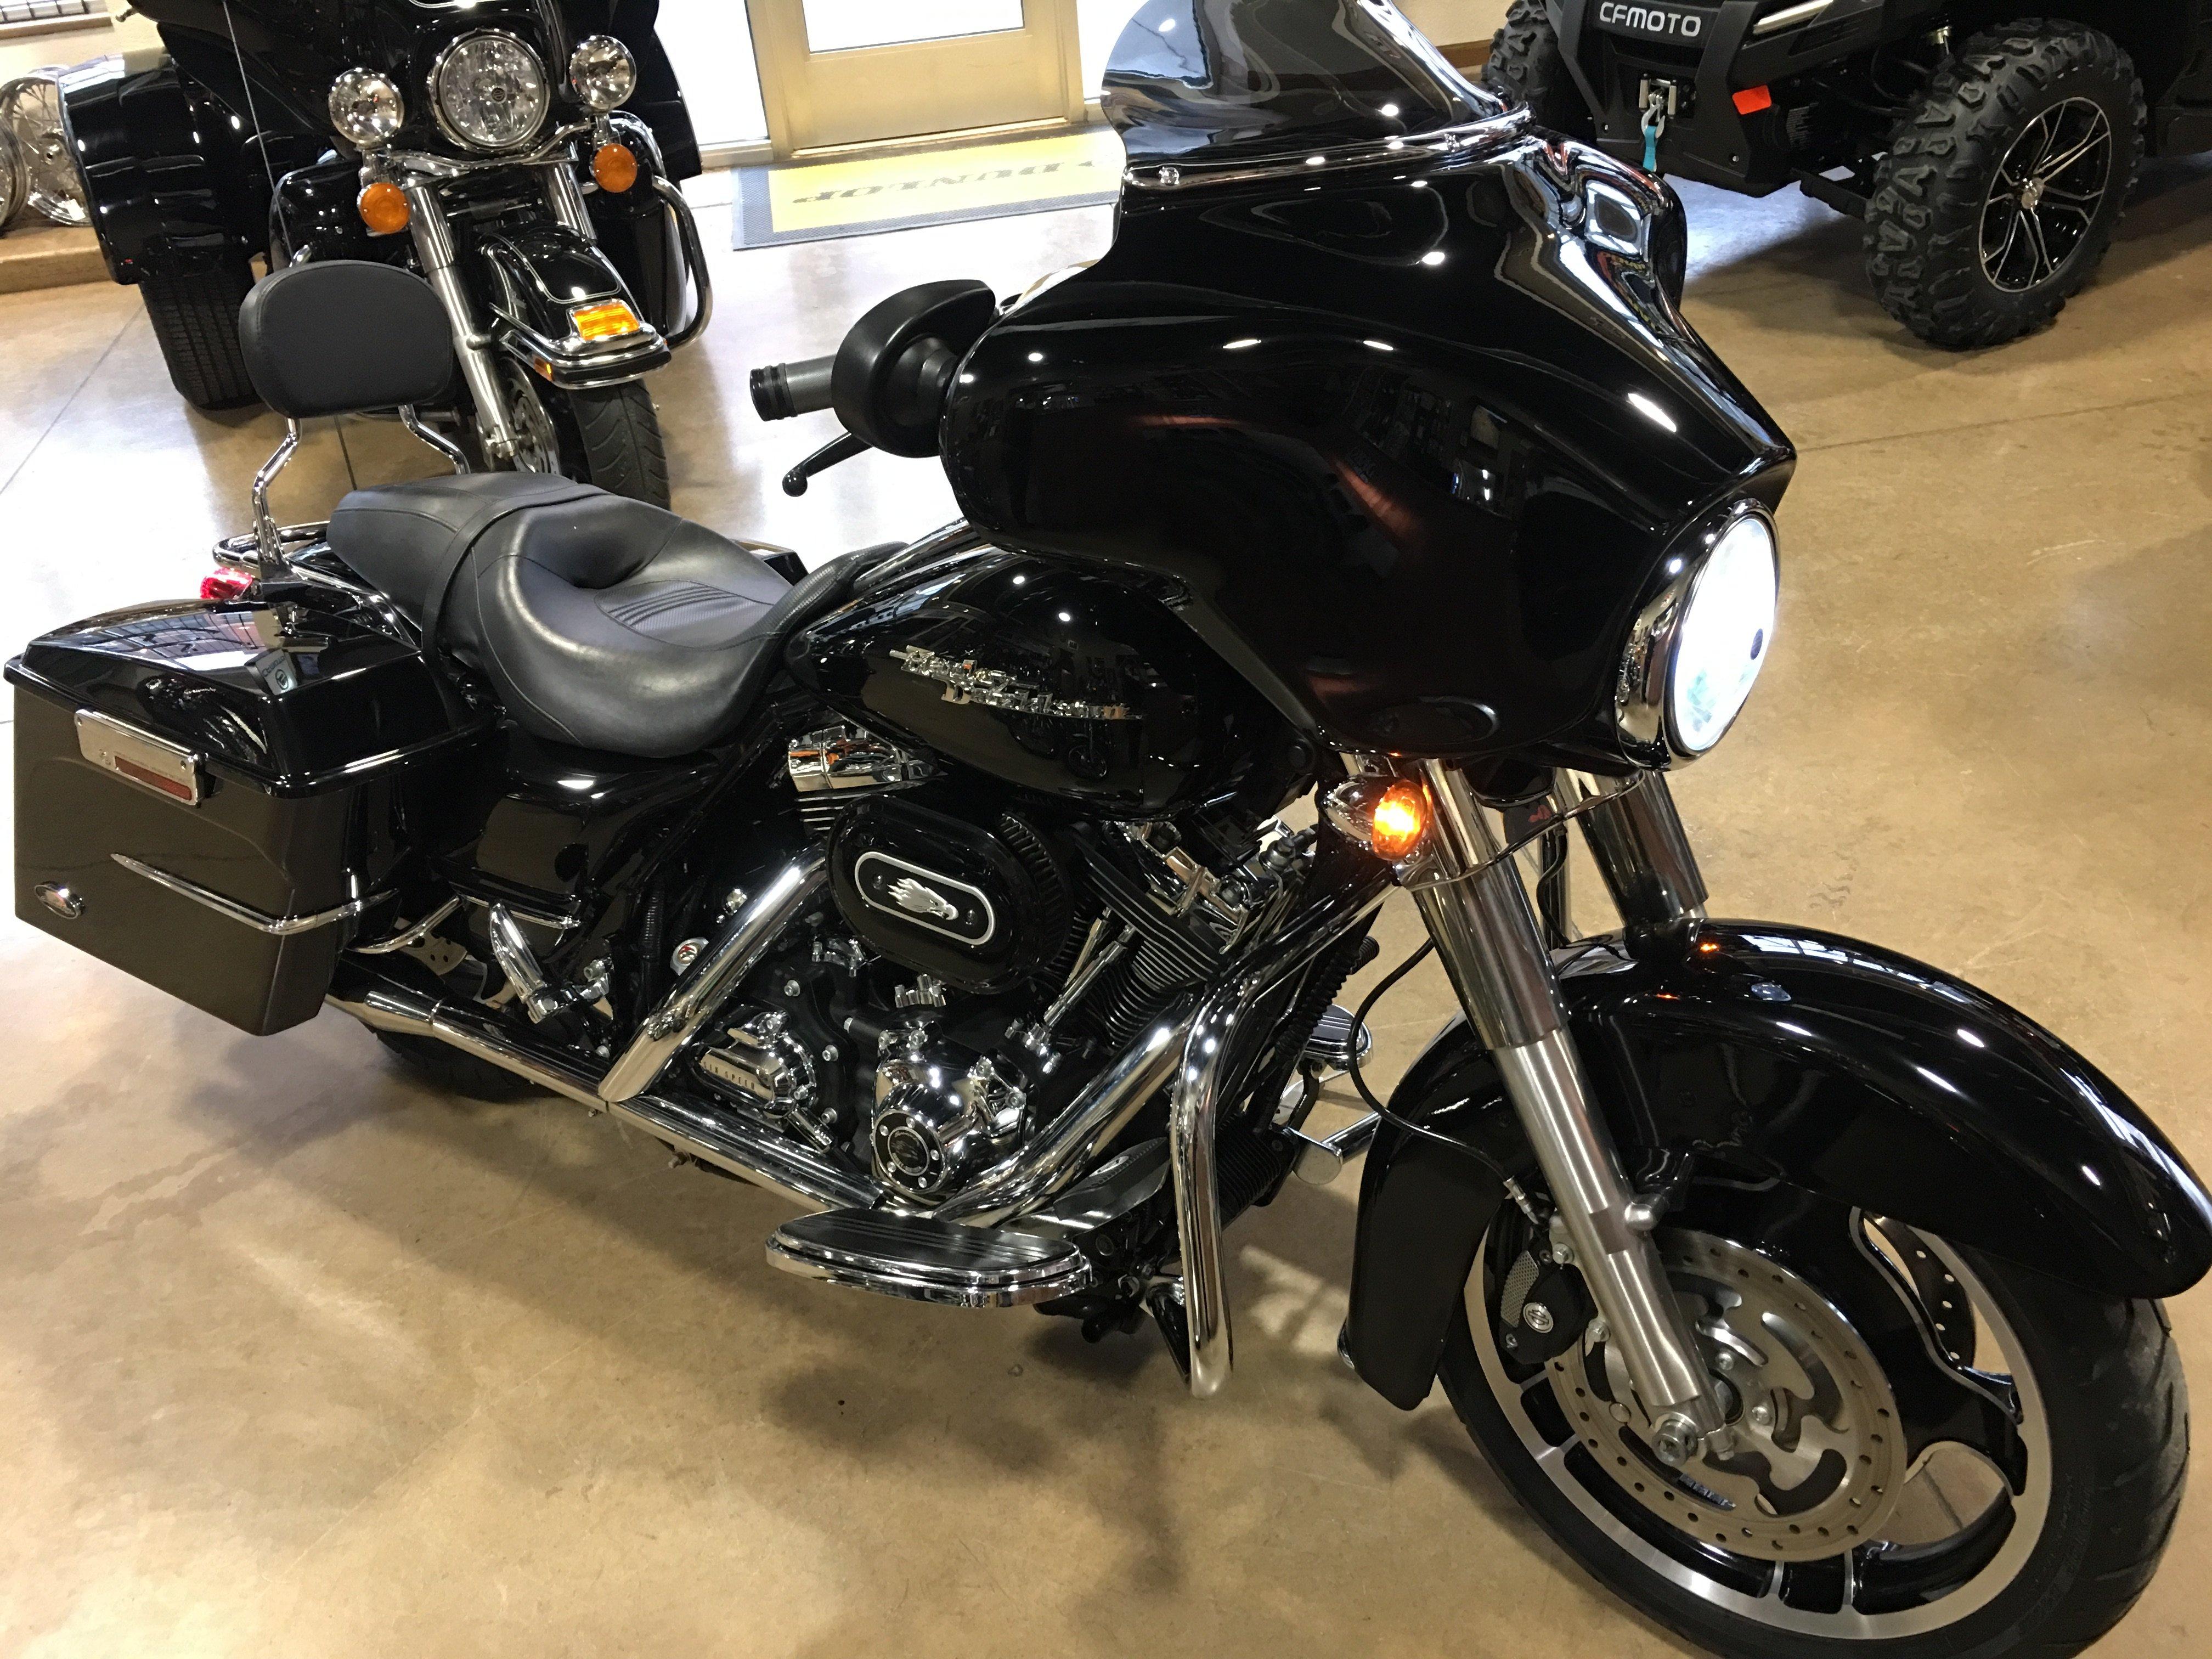 2008 Harley-Davidson FLHX Street Glide Black